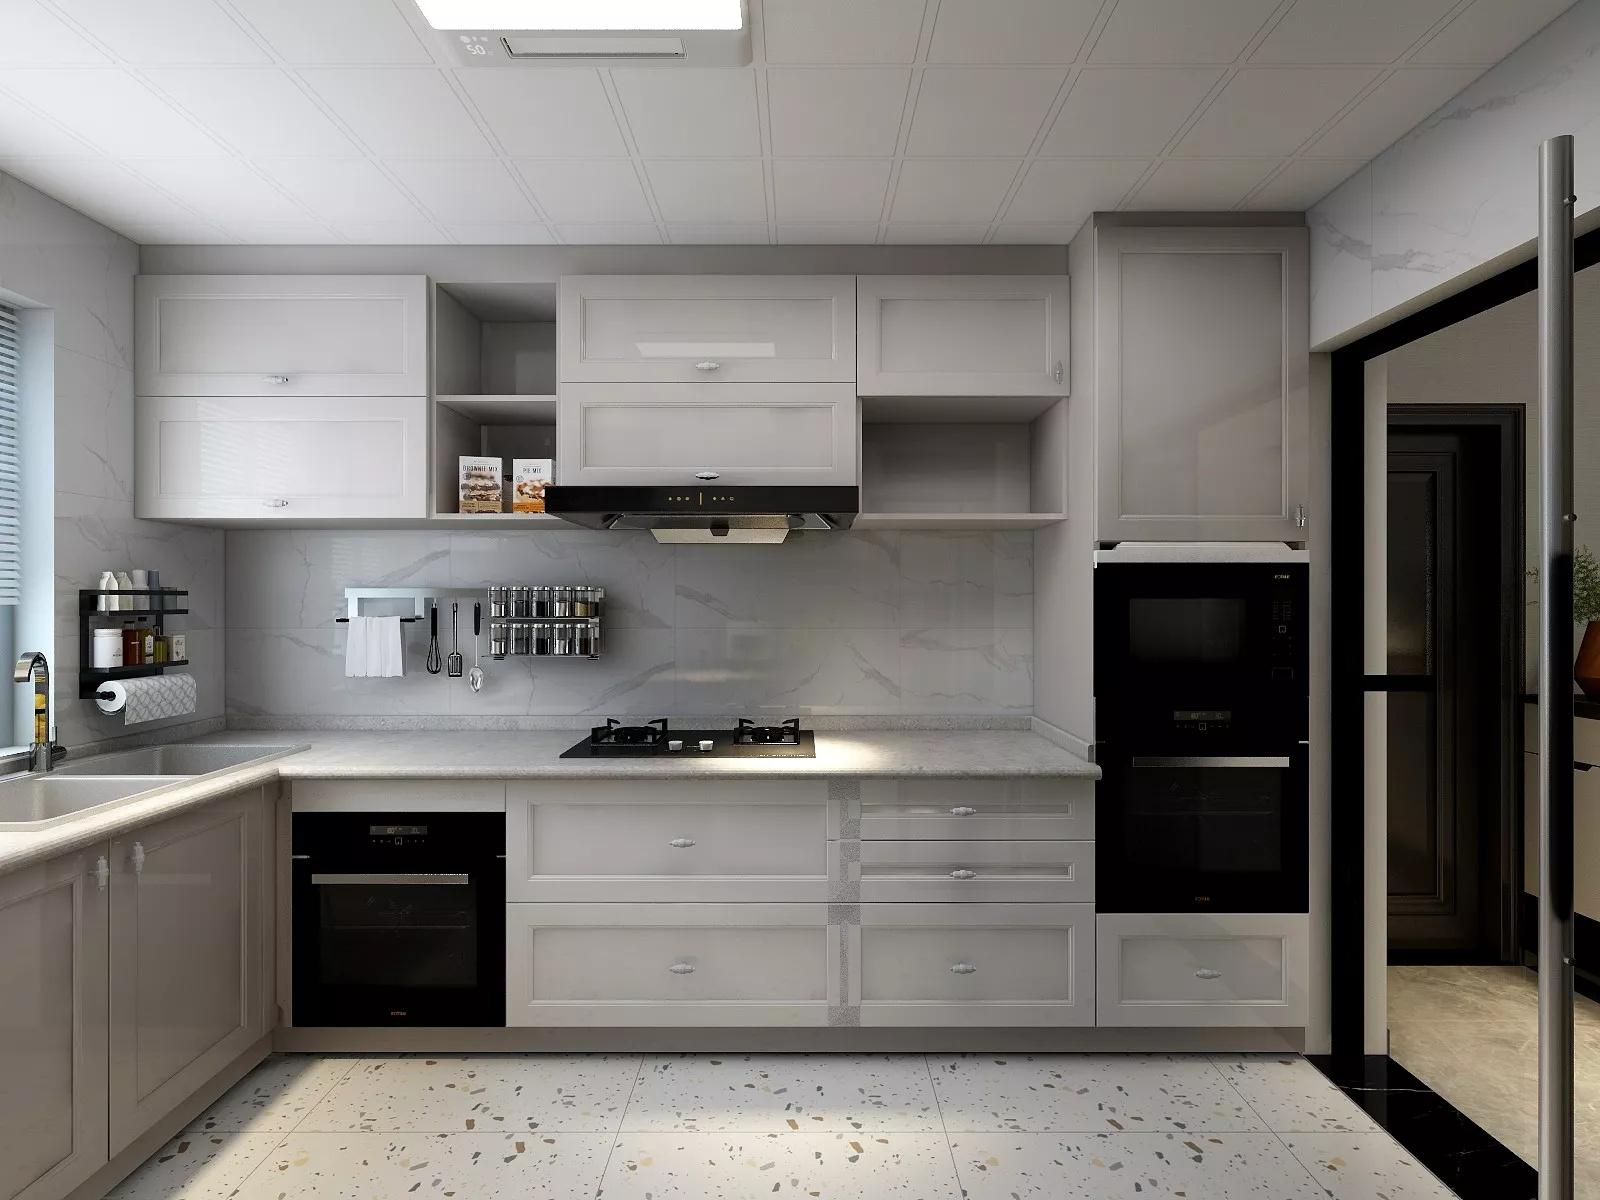 u字形简约风格厨房橱柜装修效果图